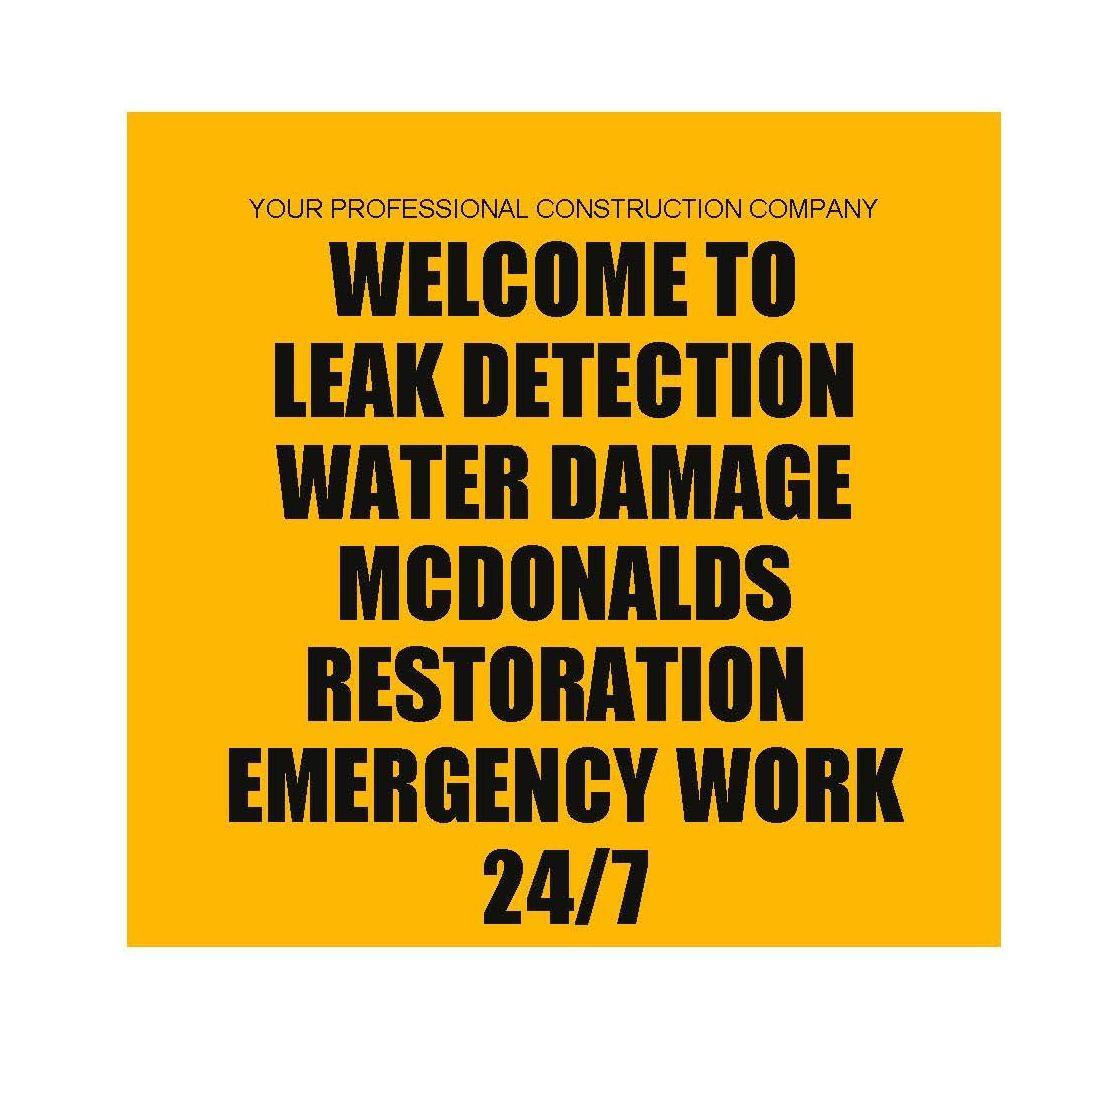 Leak Detection Mcdonalds Restoration 24/7